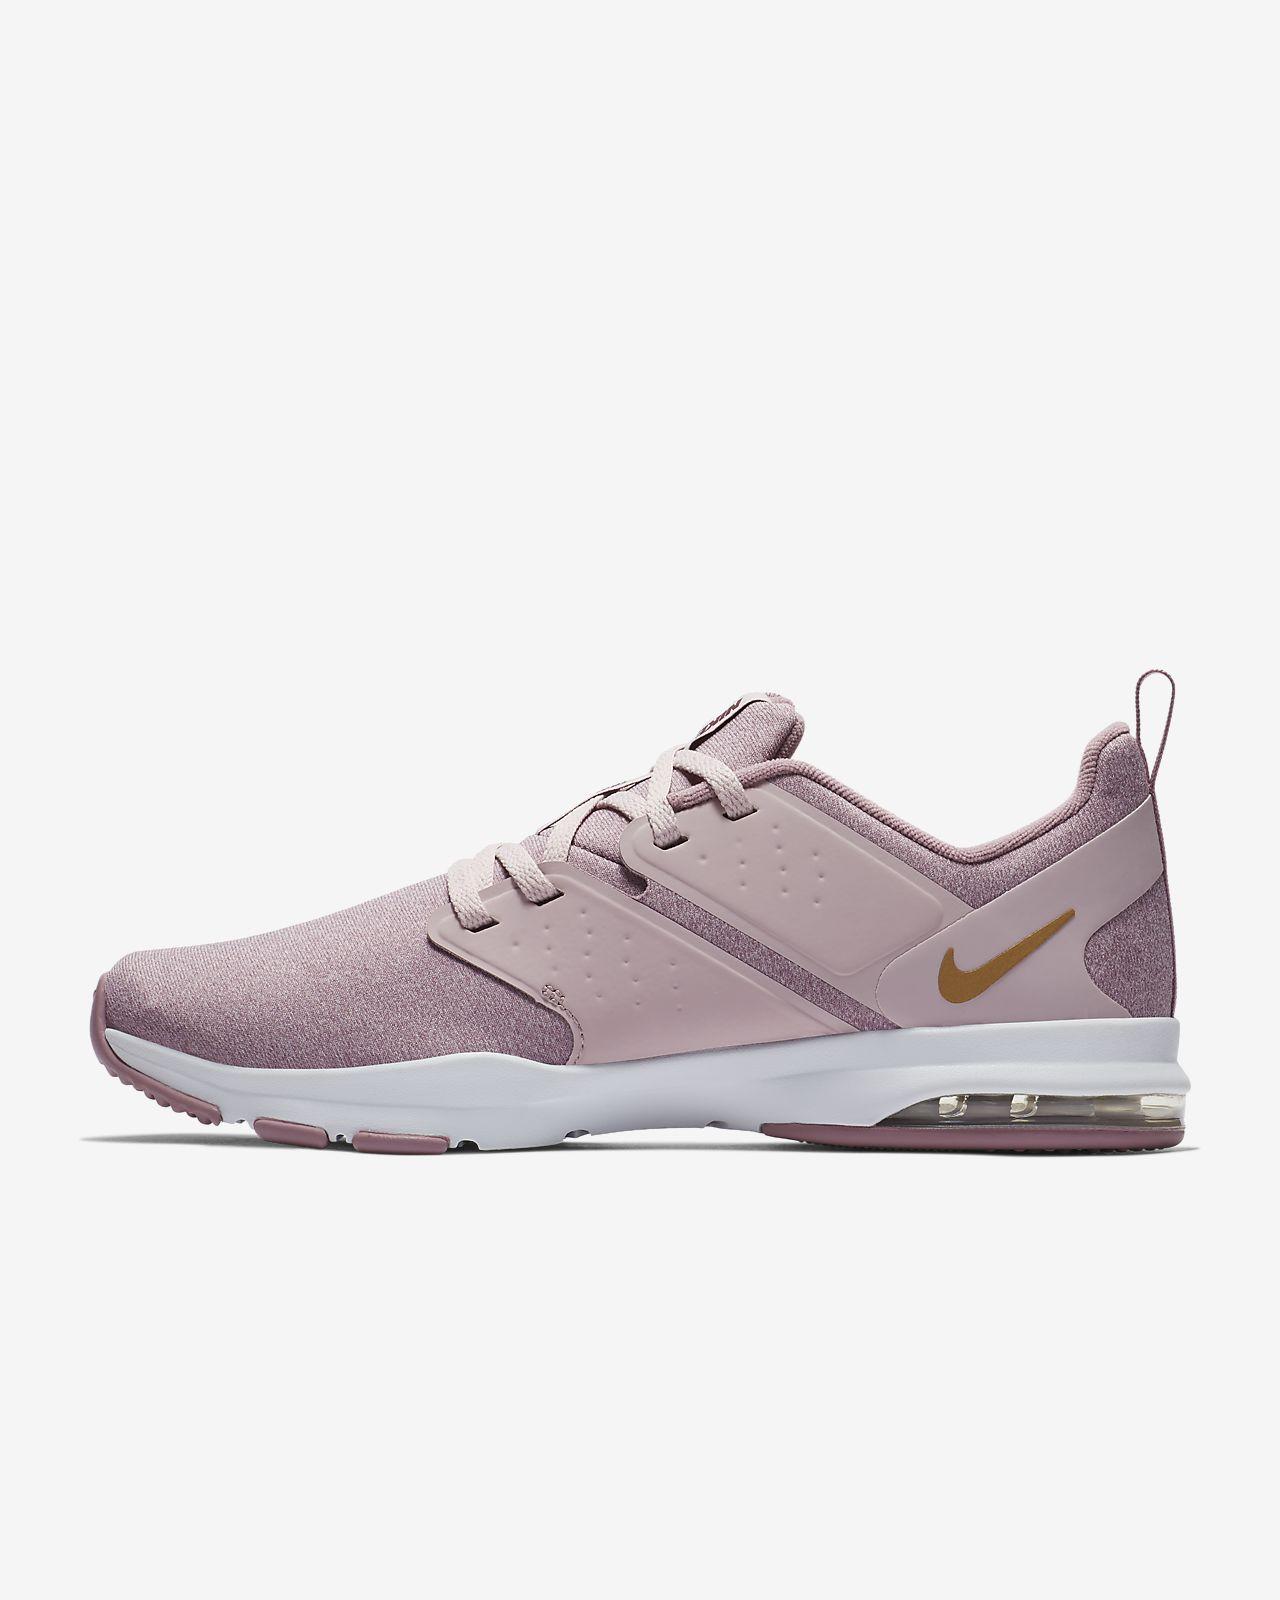 reputable site 83fb3 b8694 Women s Training Shoe. Nike Air Bella TR AMP